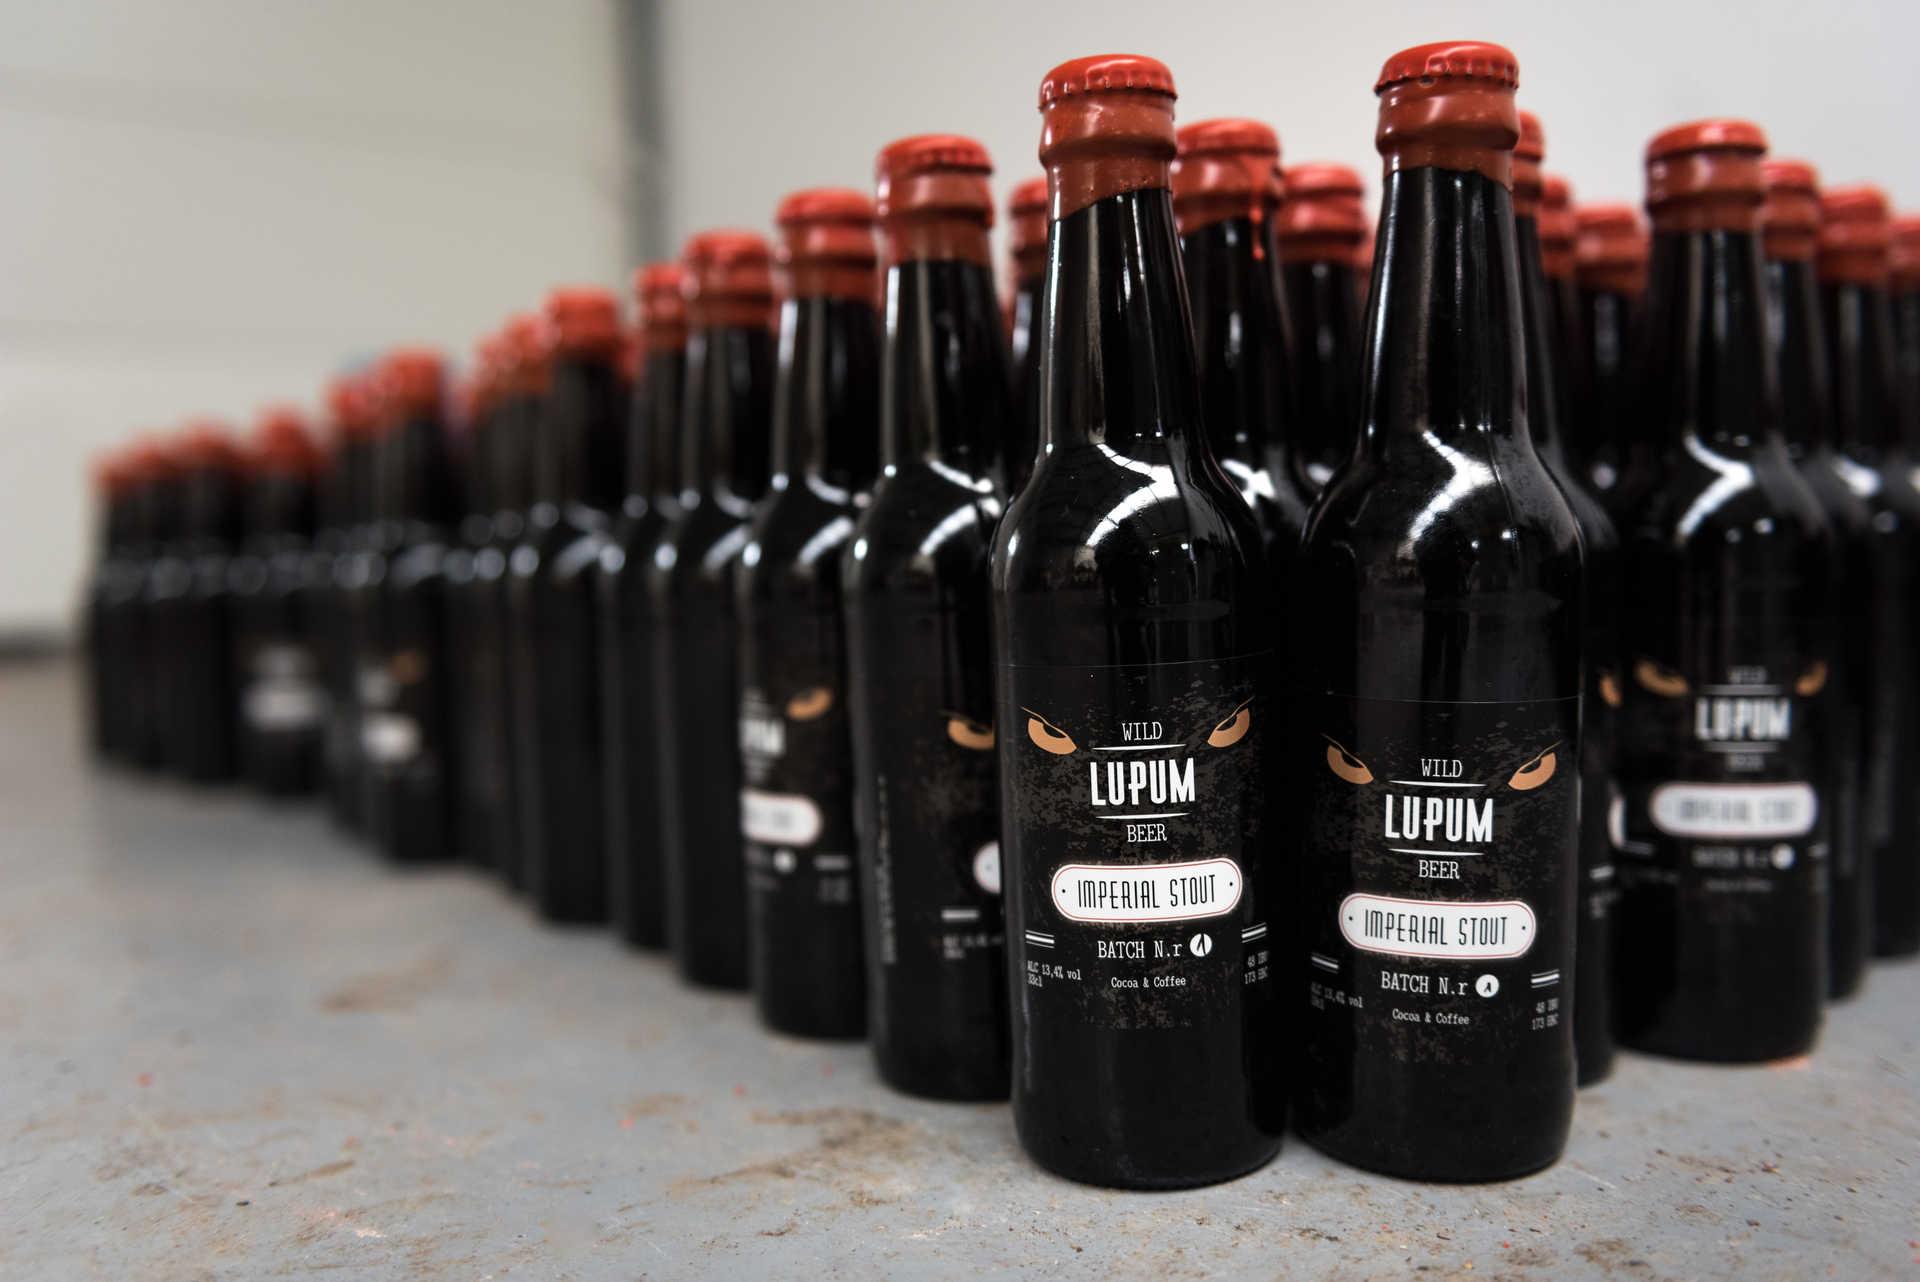 Cerveja artesanal Lupum António Lopes